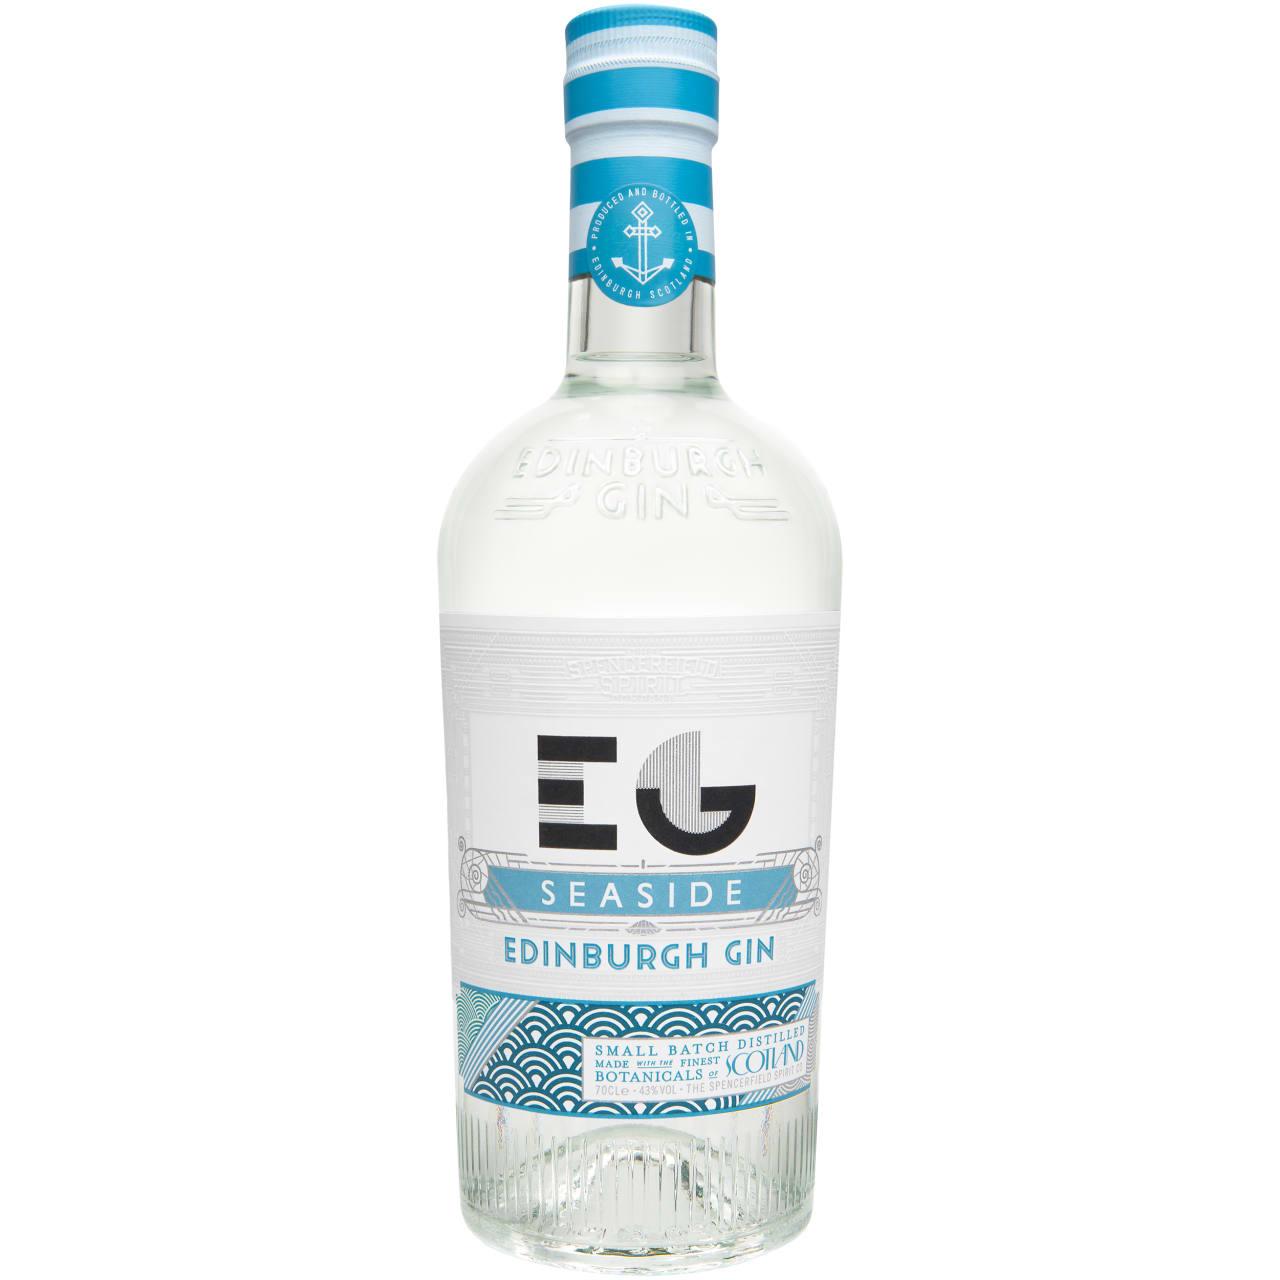 Product Image - Edinburgh Gin Seaside